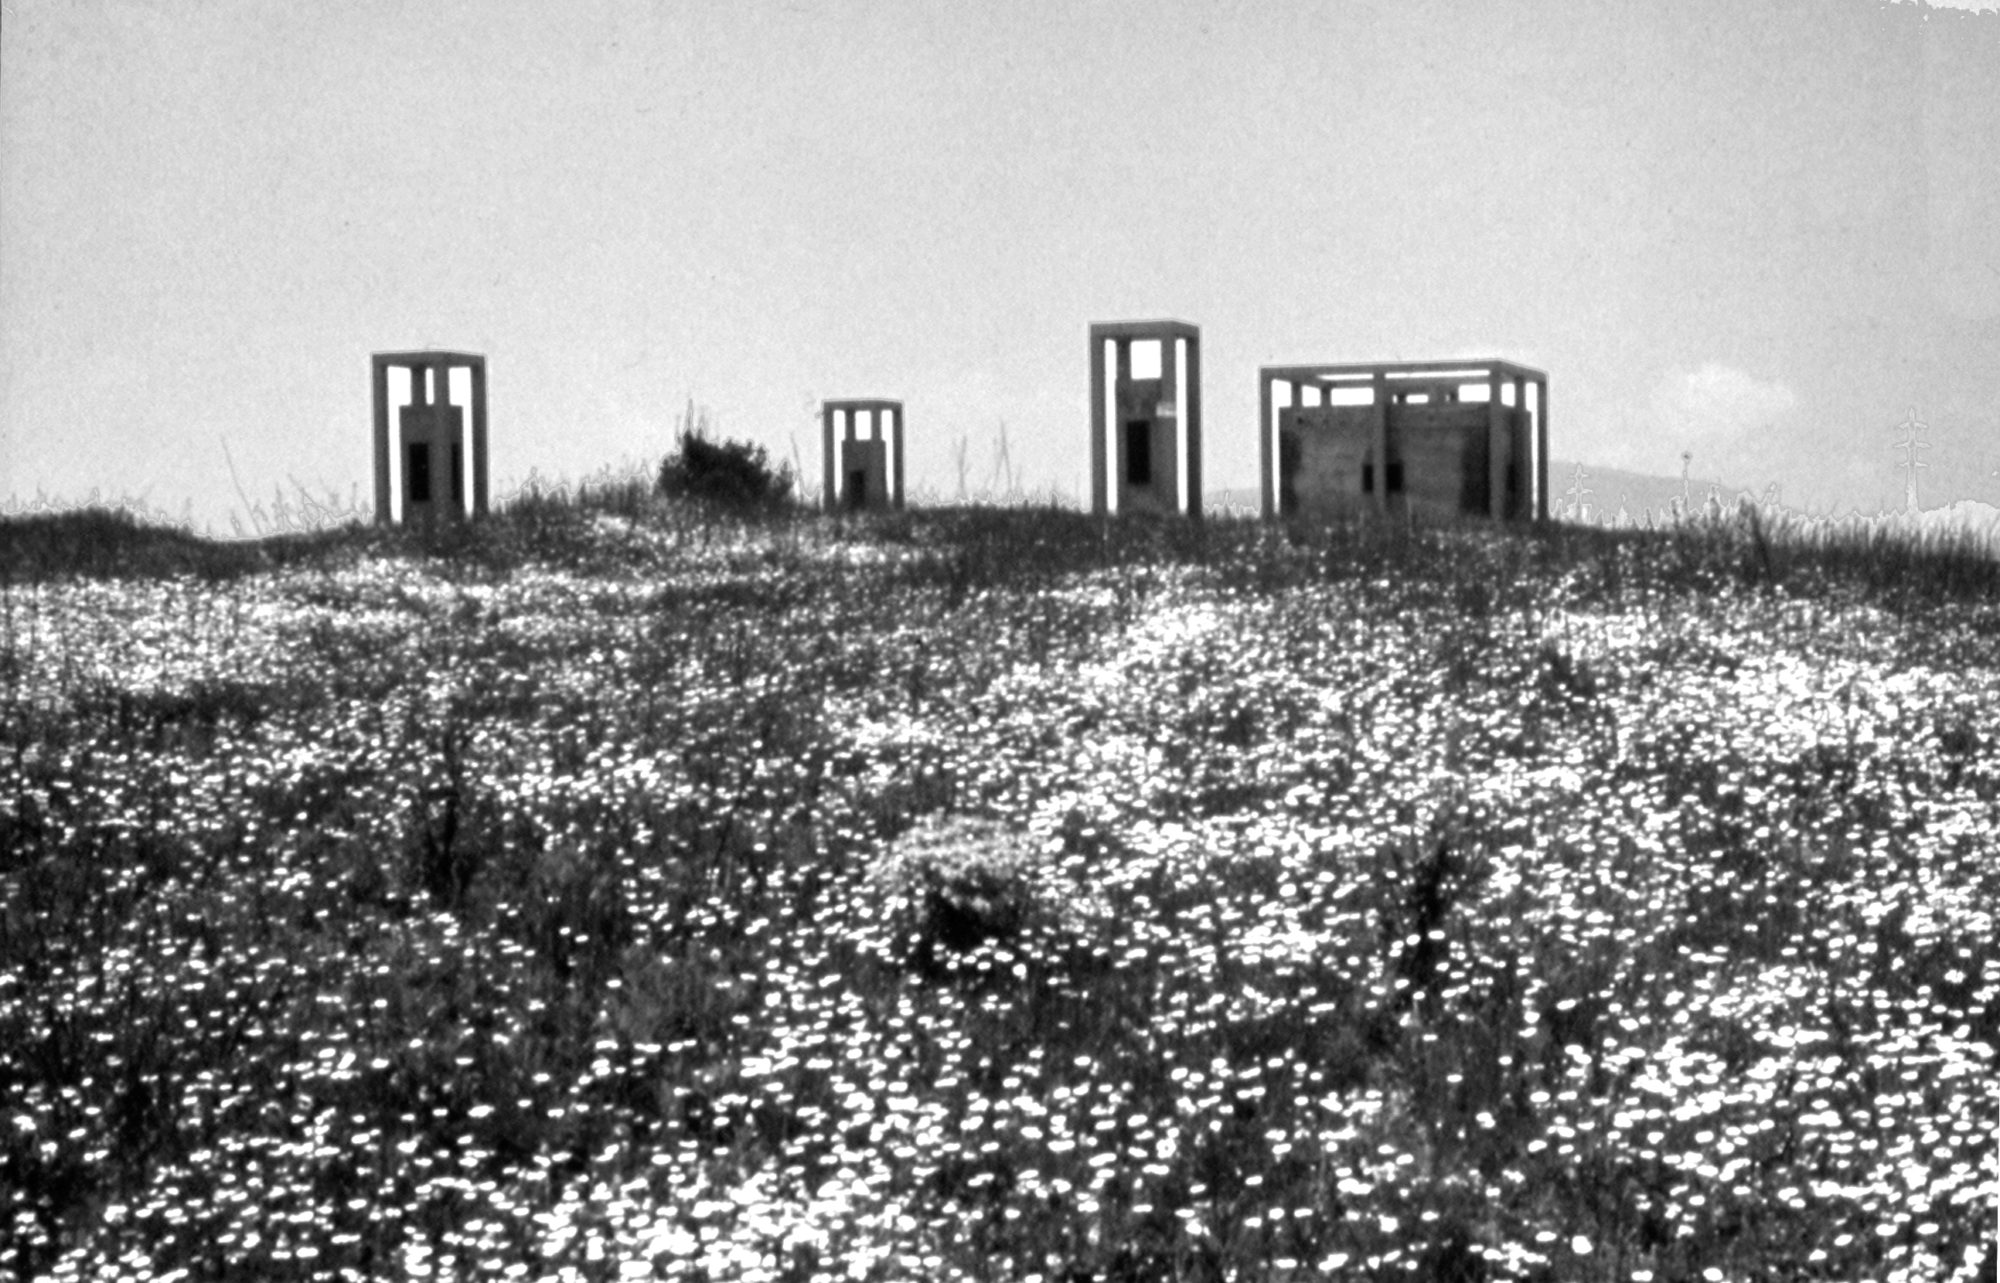 Access and ventilation towers of an underground water tank - Garcés - de Seta - Bonet